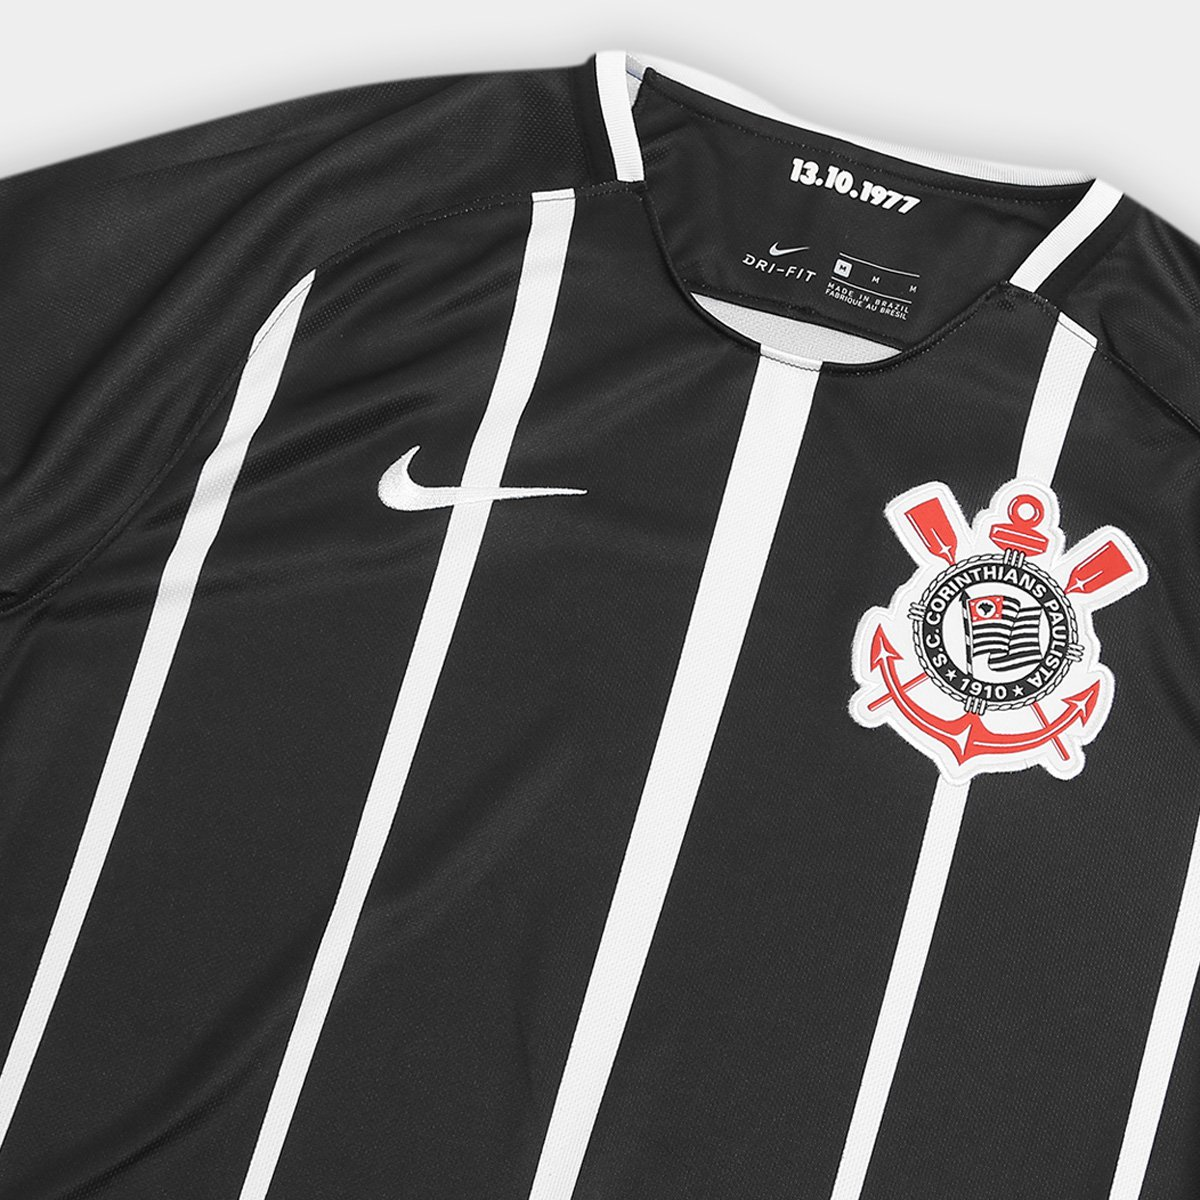 ... Camisa Corinthians II 17 18 s nº Torcedor Nike Masculina - Preto e . 8c9564b90100c